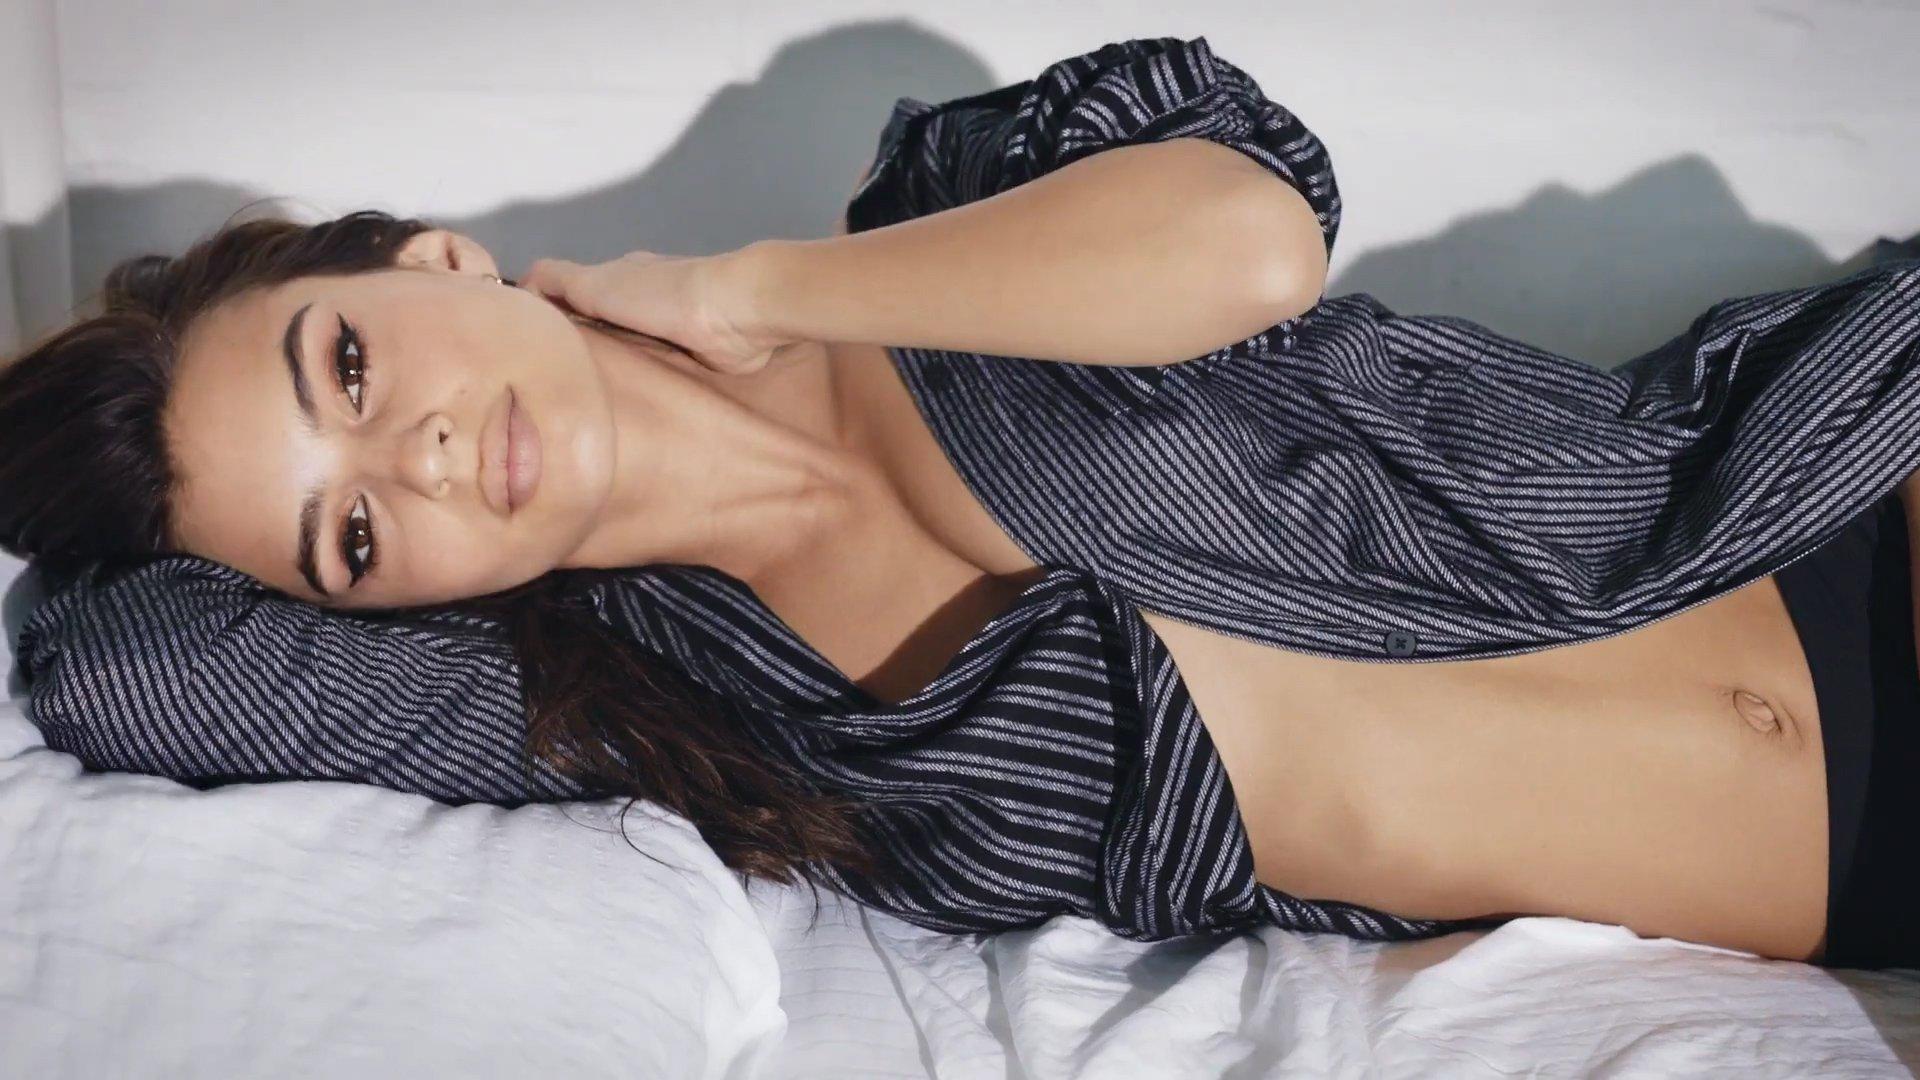 Emily Ratajkowski Perfect Ass In Thong Bikini | Hot Celebs